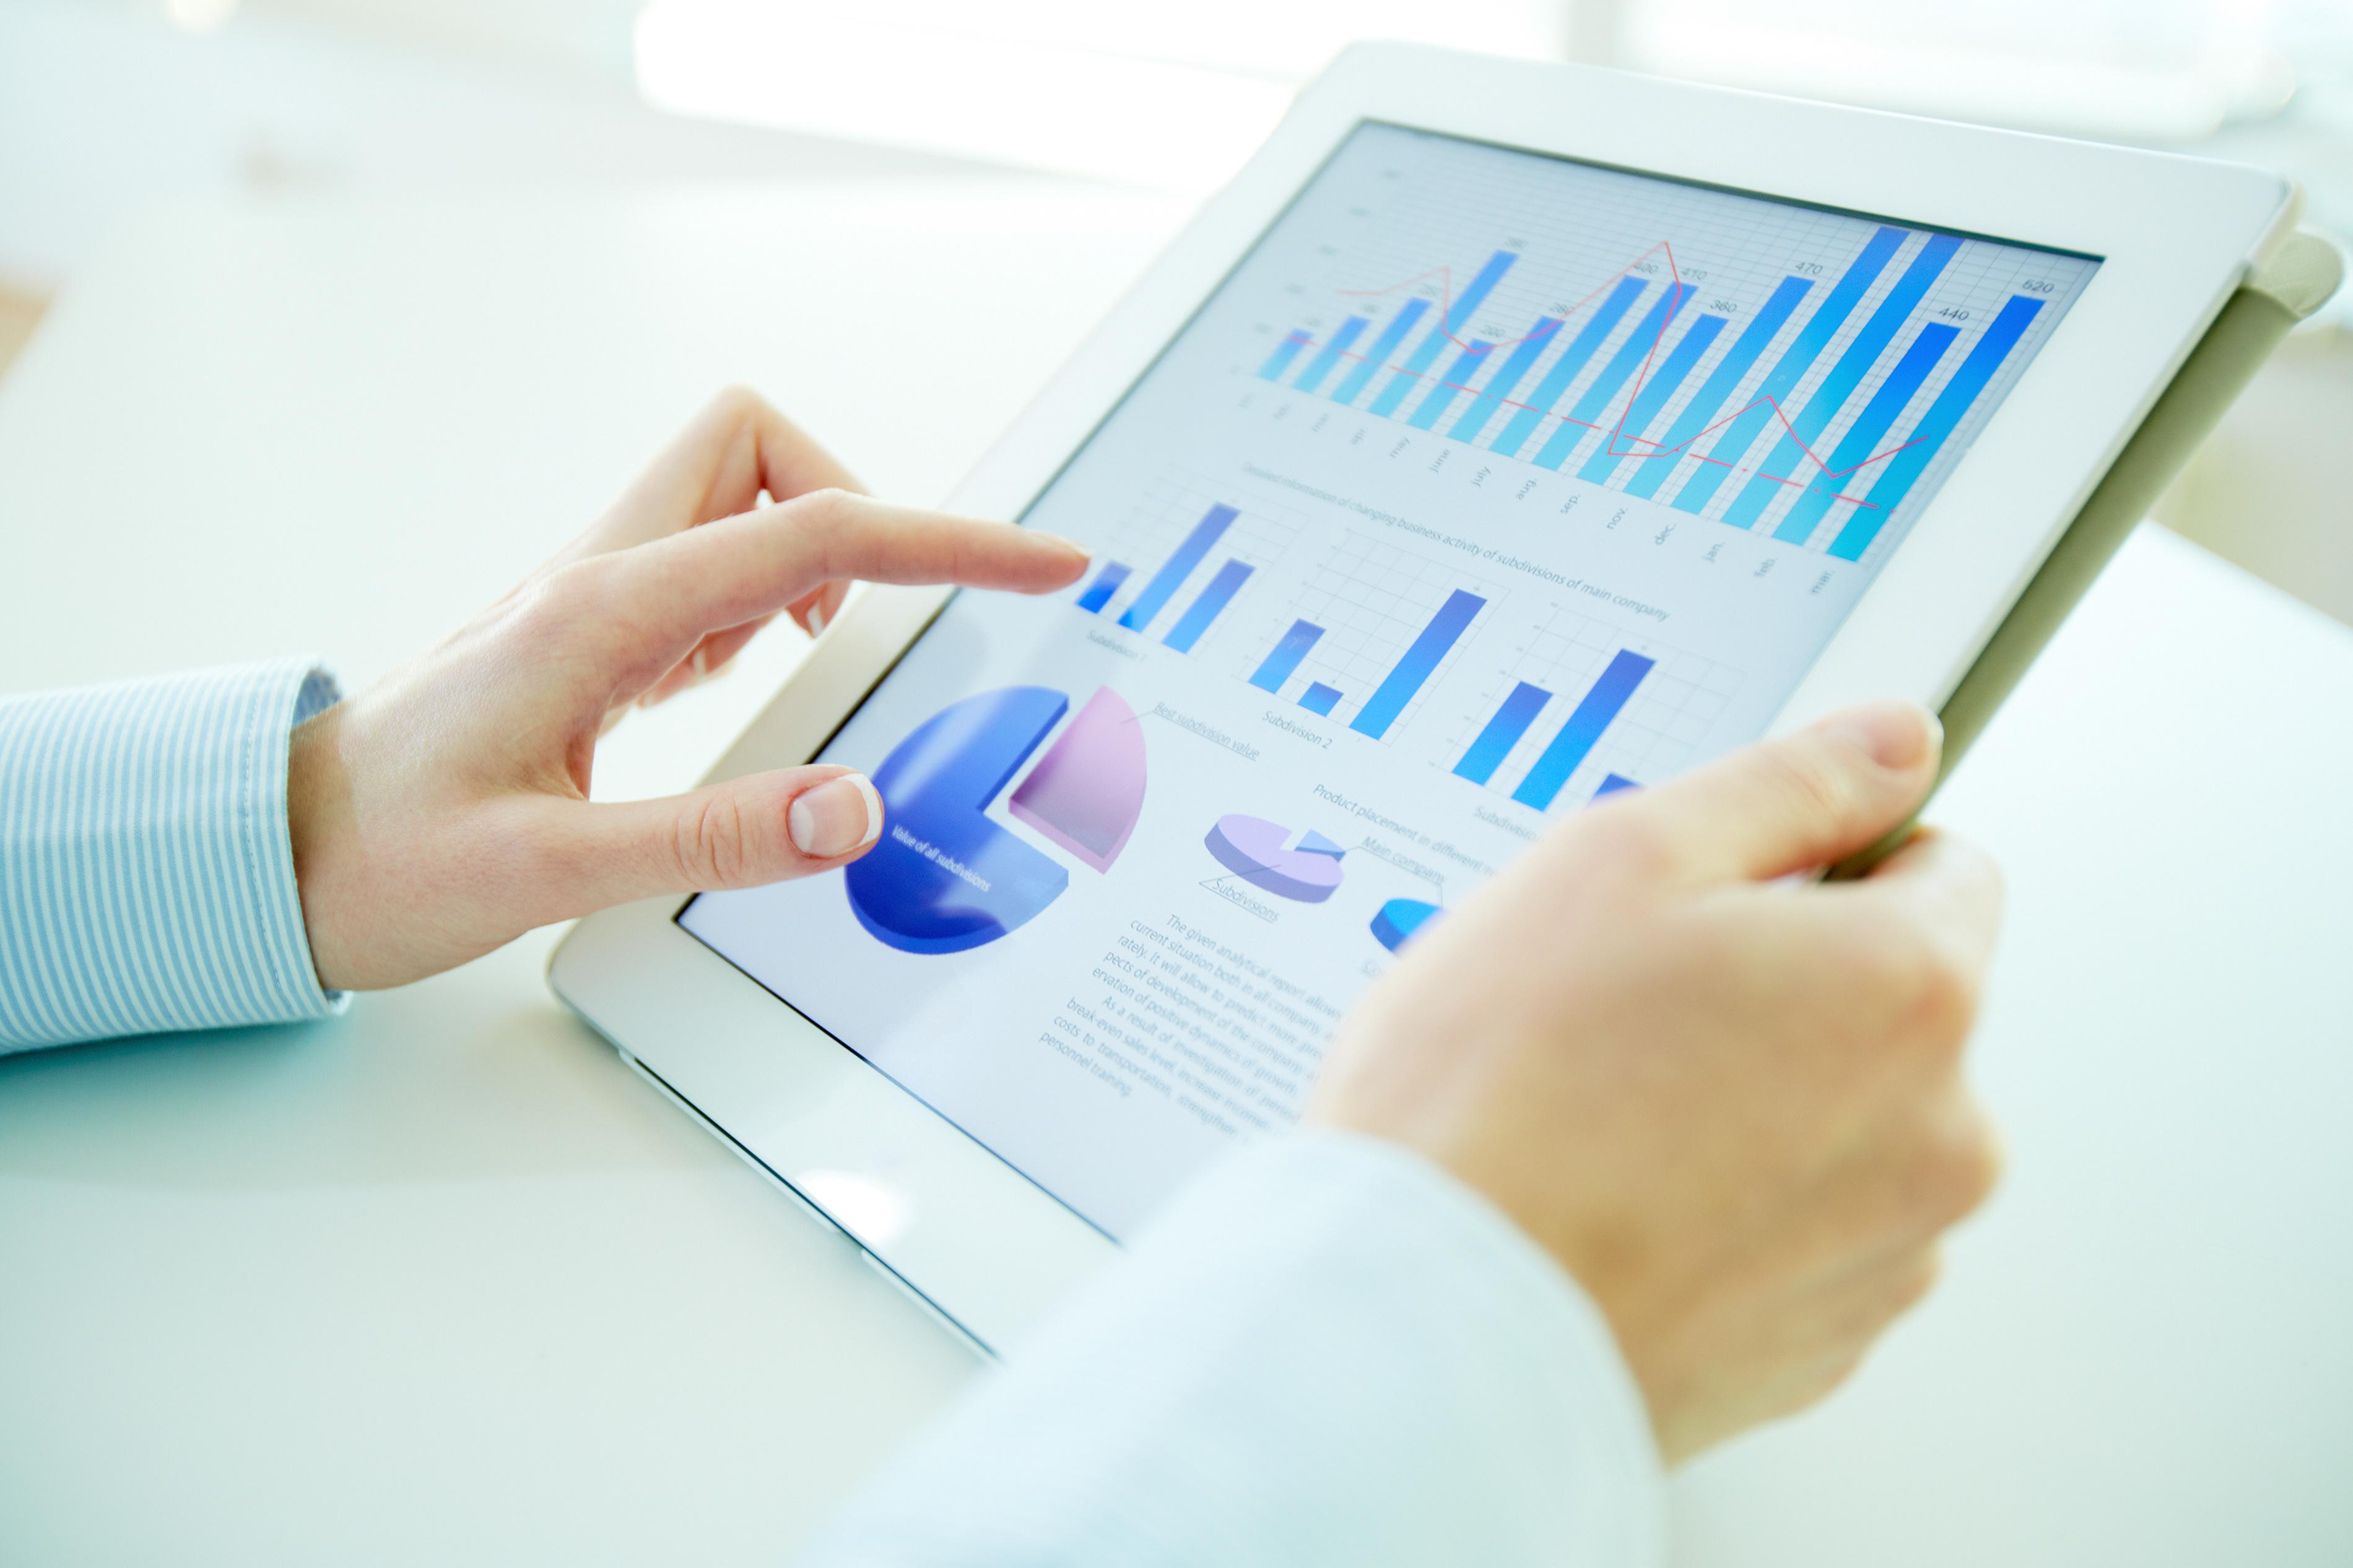 Top Ten Needs for Intelligence Analysis Tool Development